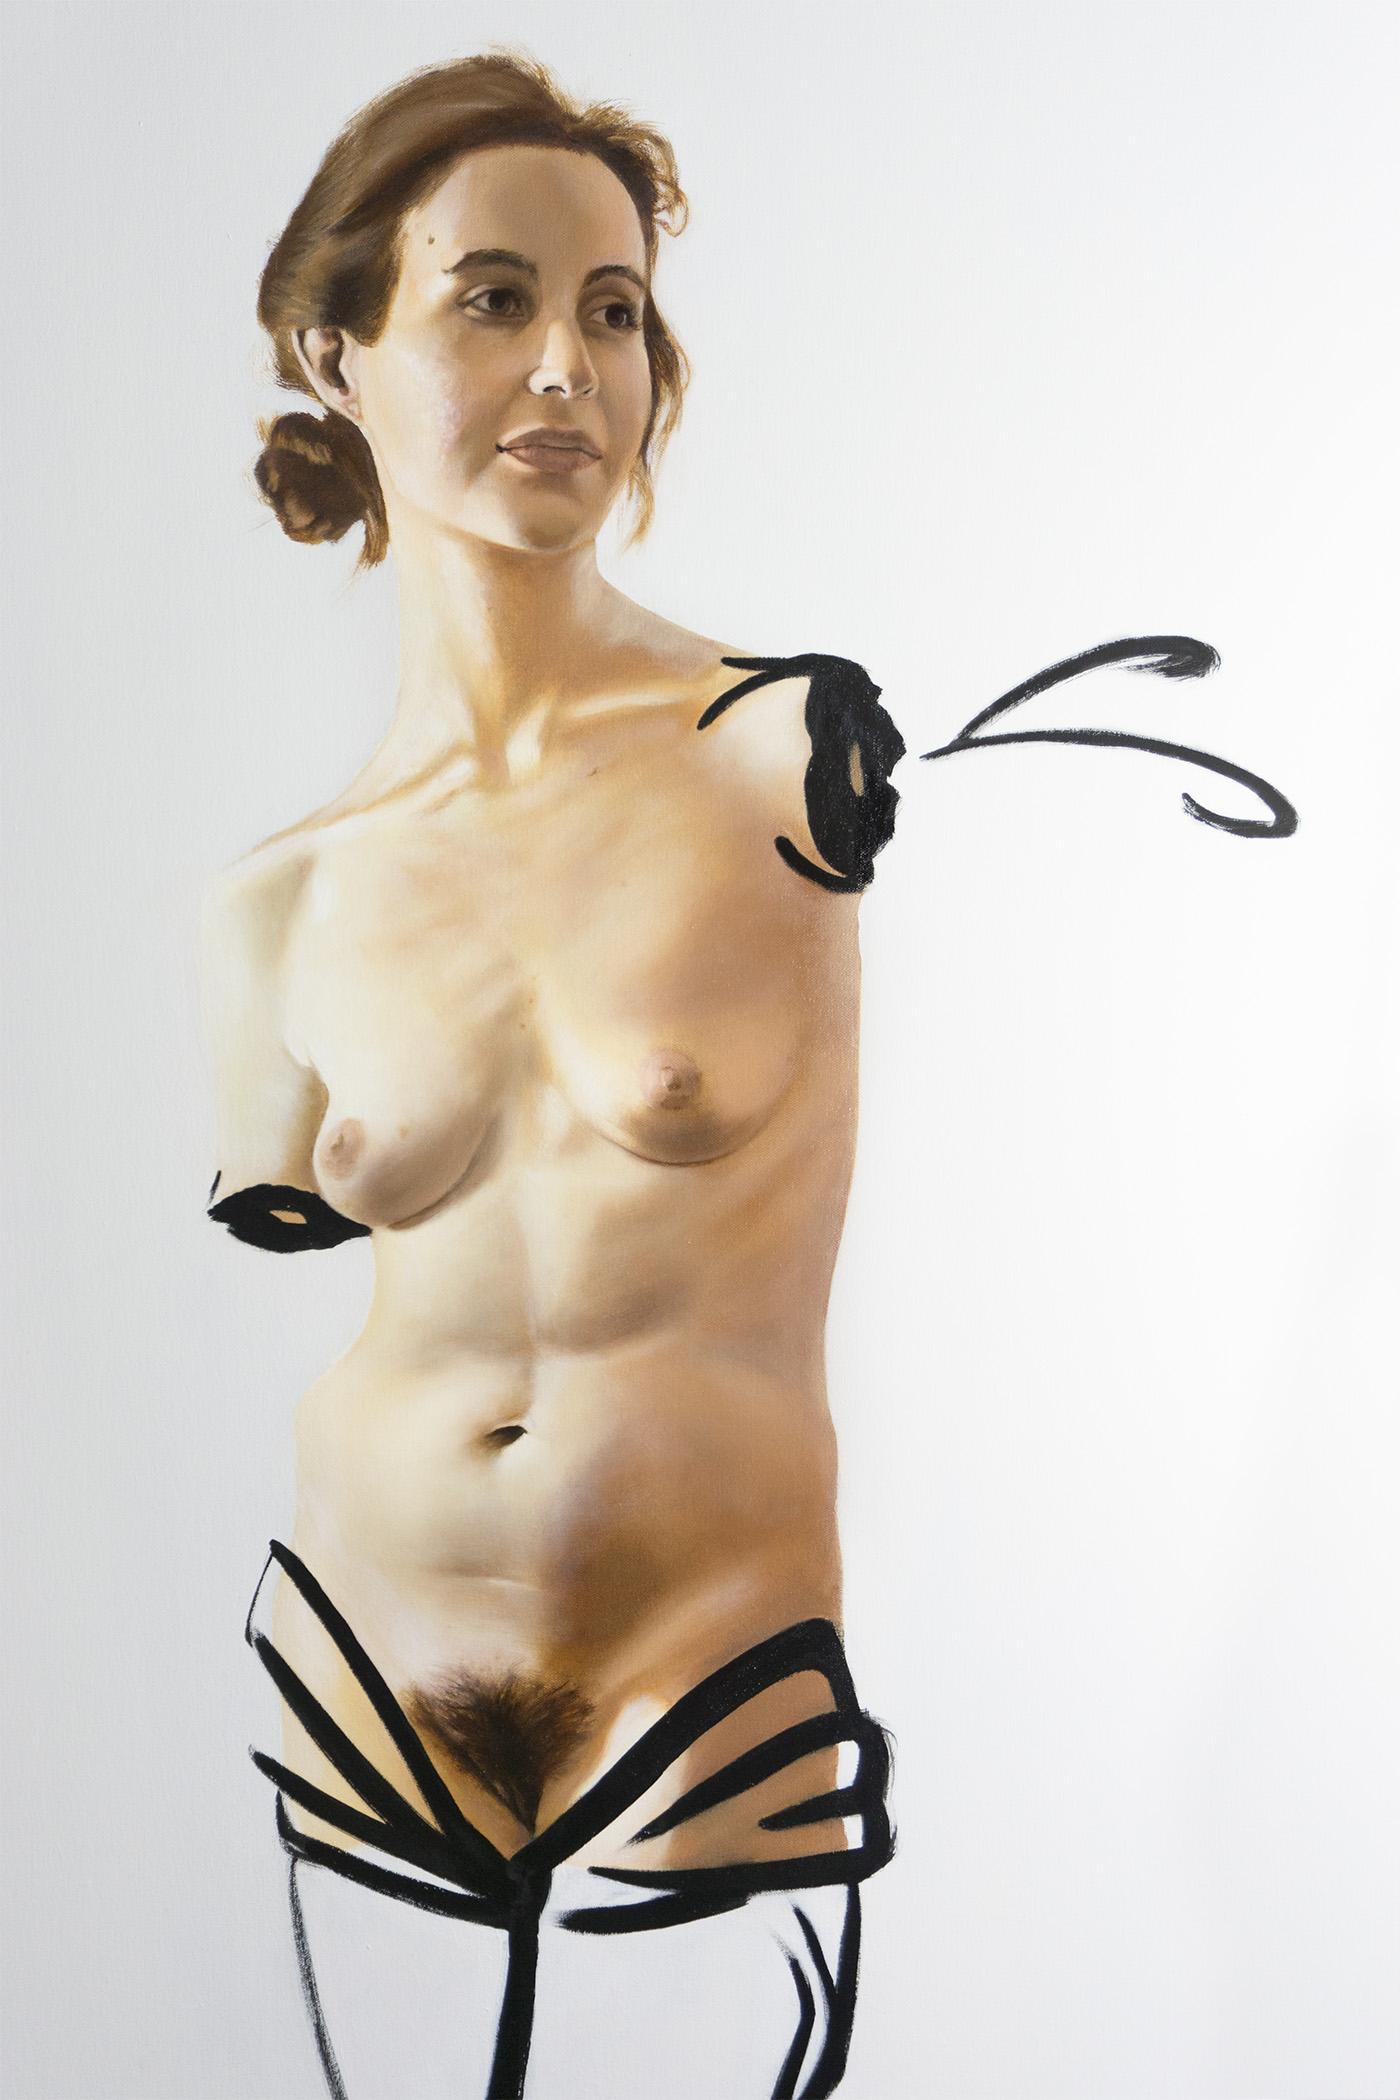 Detail: Venus in Ferns